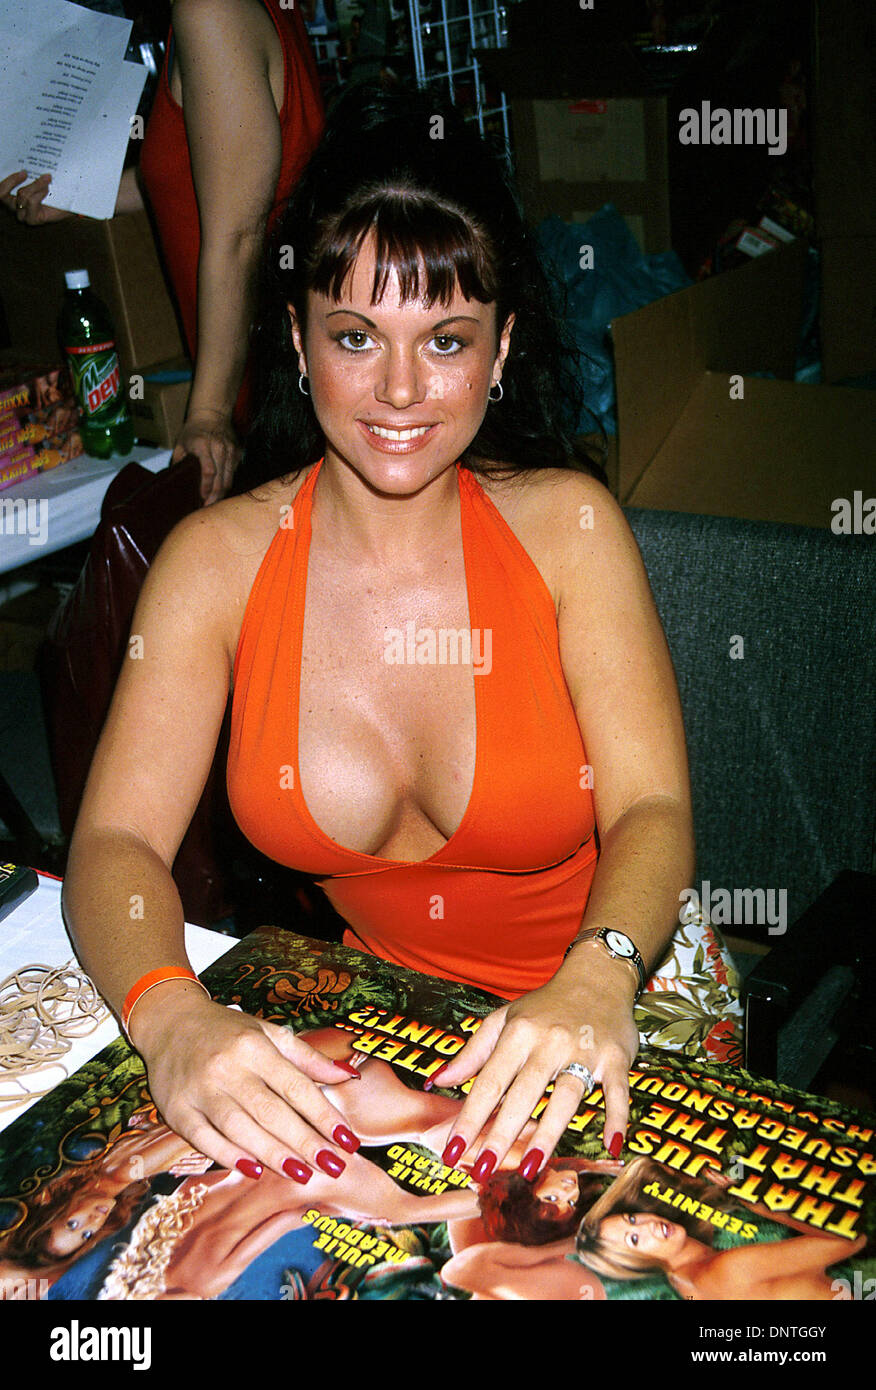 June 12 2002 Los Angeles Ca Usa K25241eg Erotica L A 2002 Fan Convention Los Angeles Convention Center La Ca  Jewel Denyle